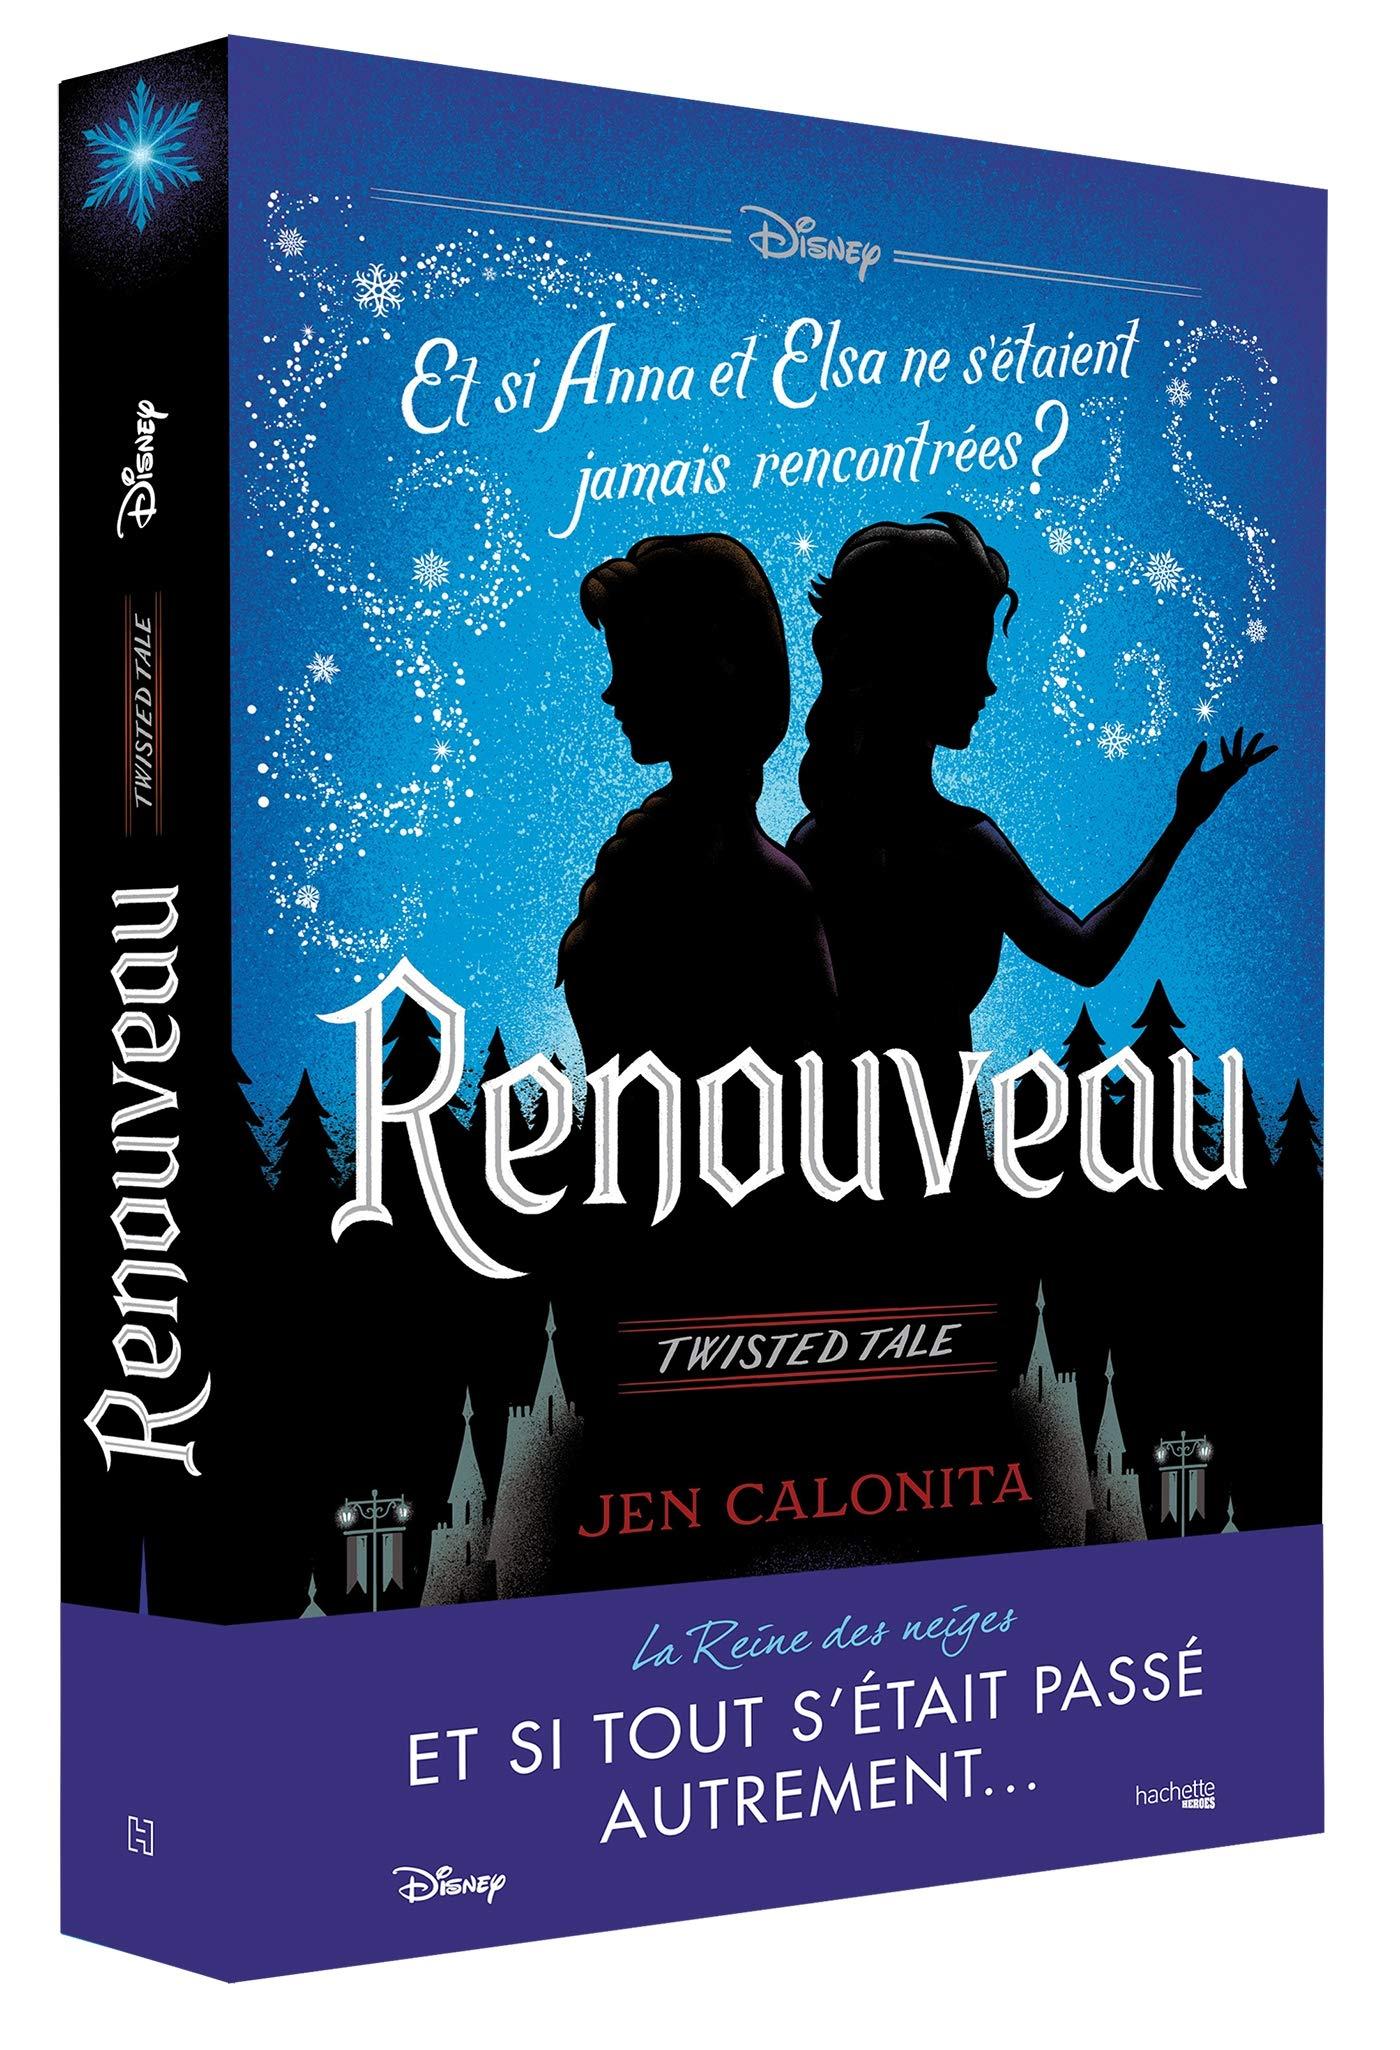 Disney Roman - Le renouveau Edition collector Twisted Tales